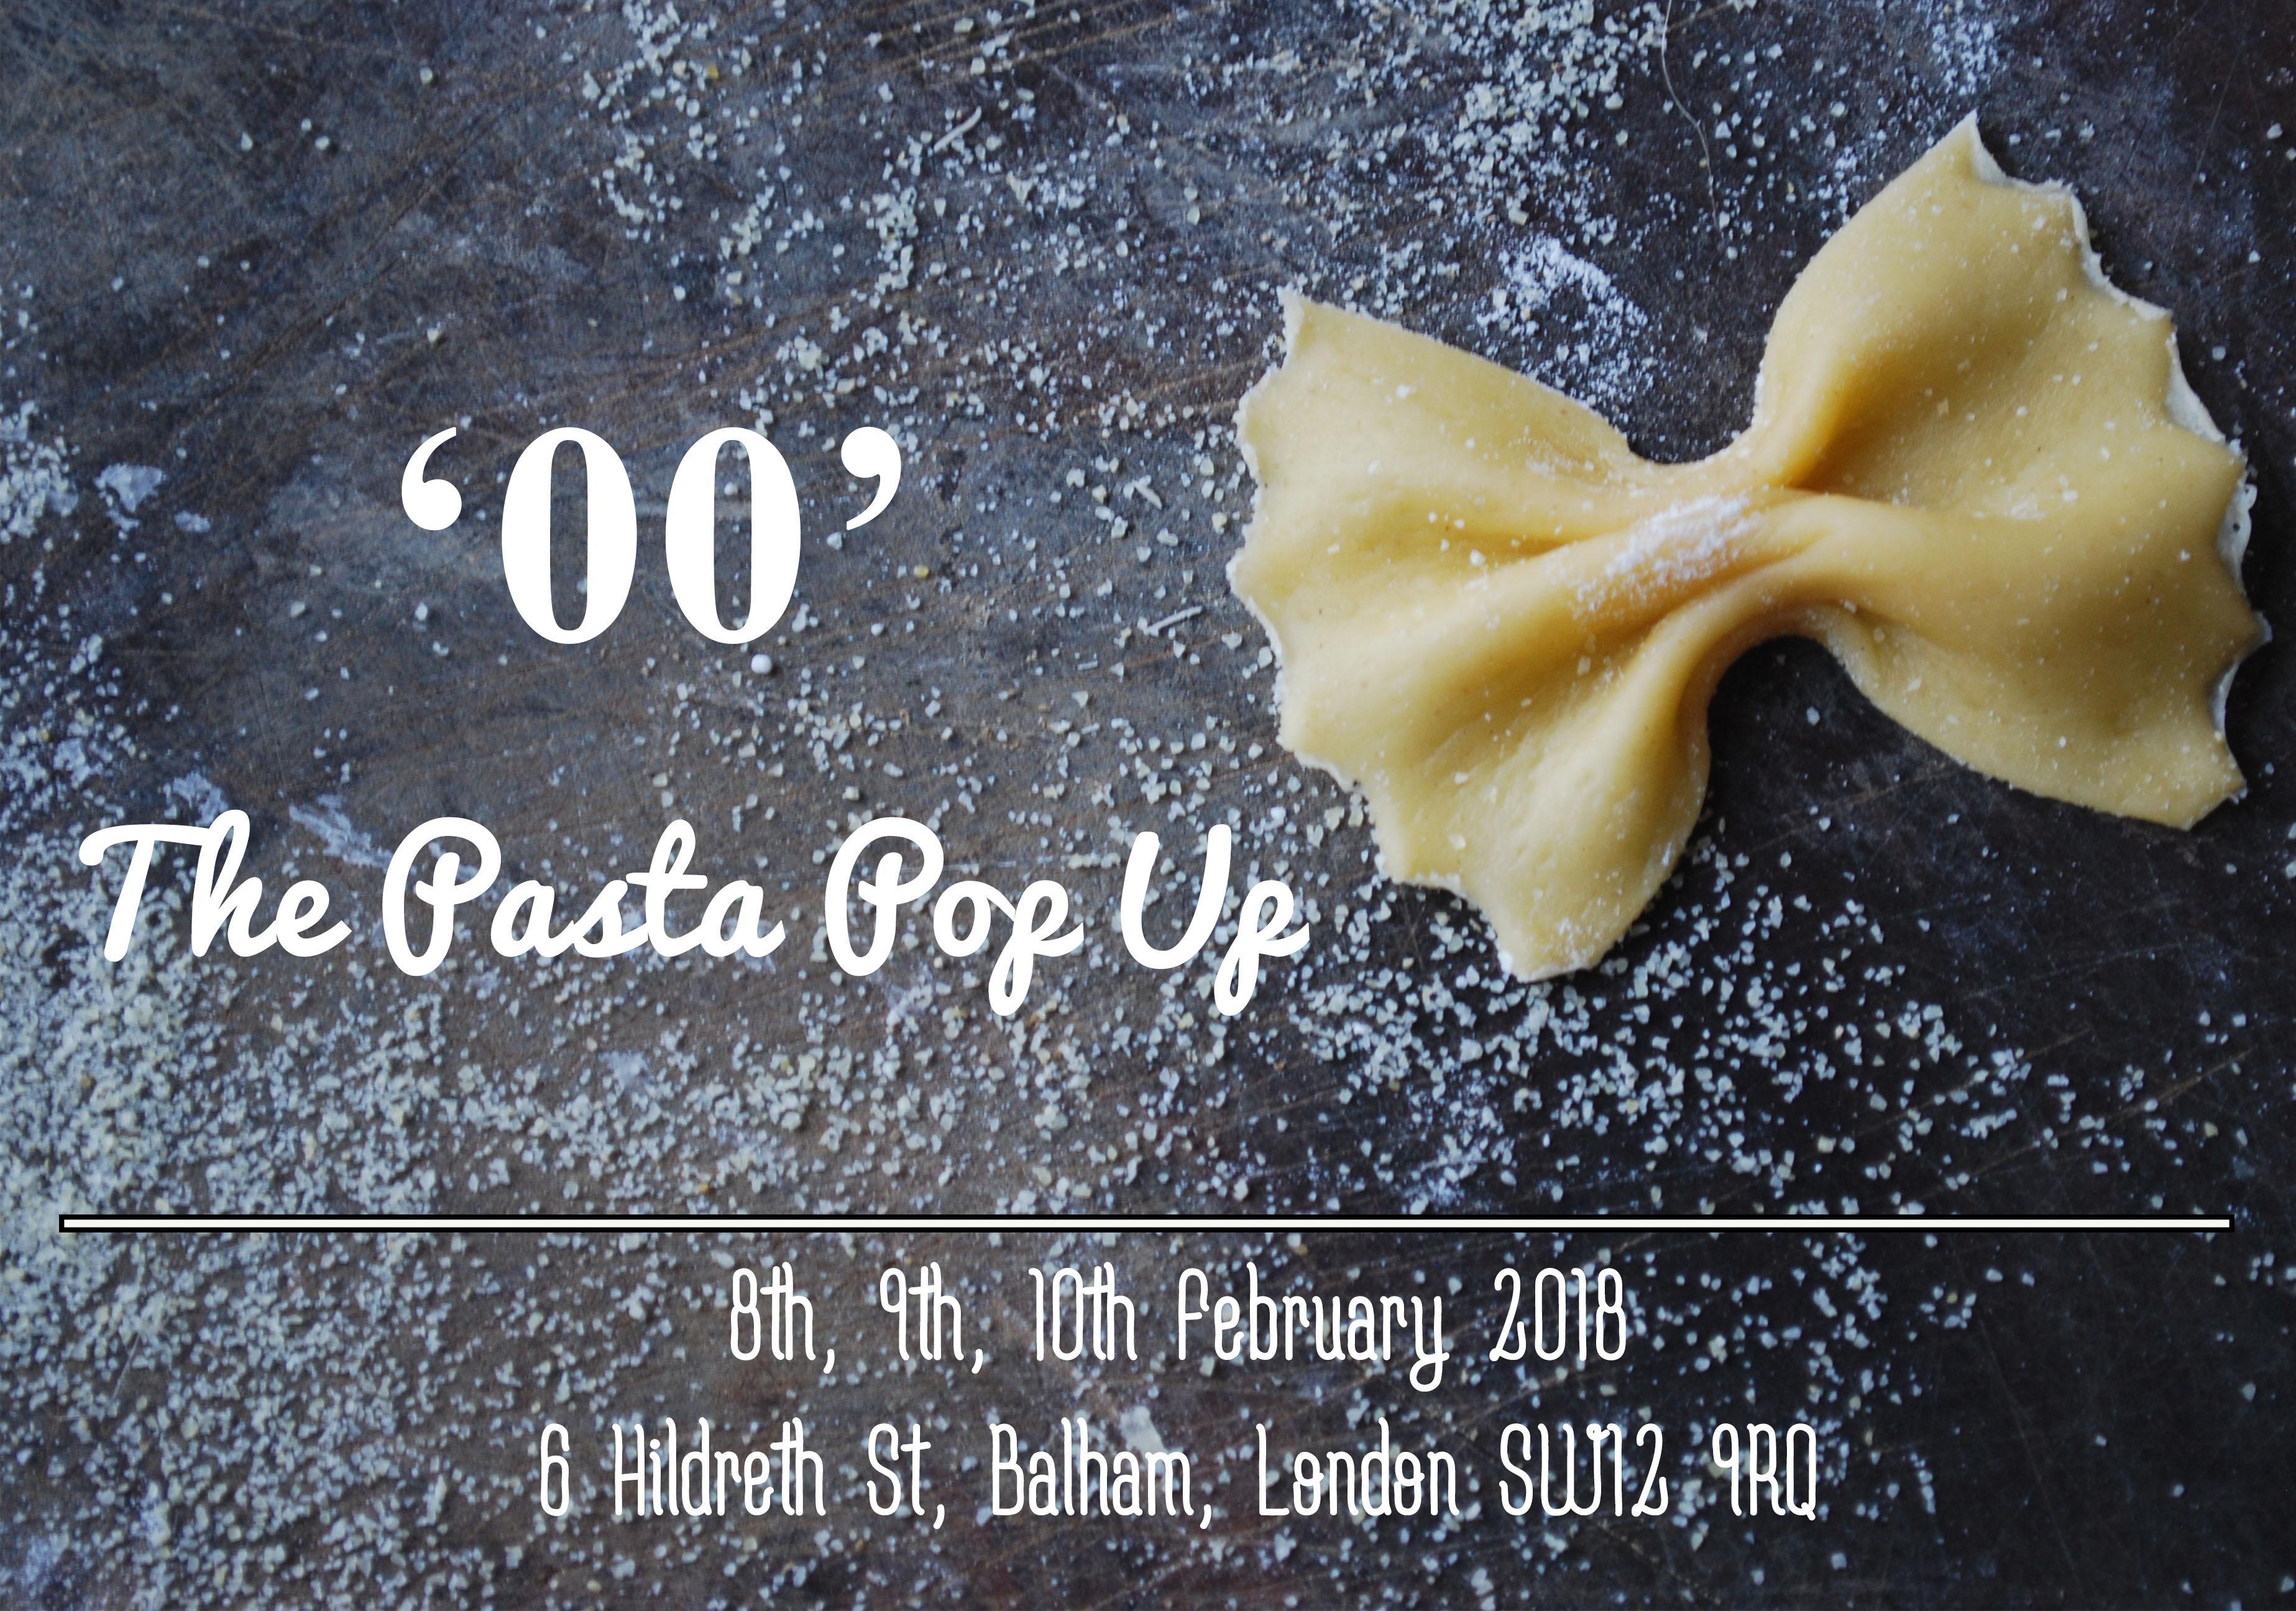 '00' The Pasta Popup